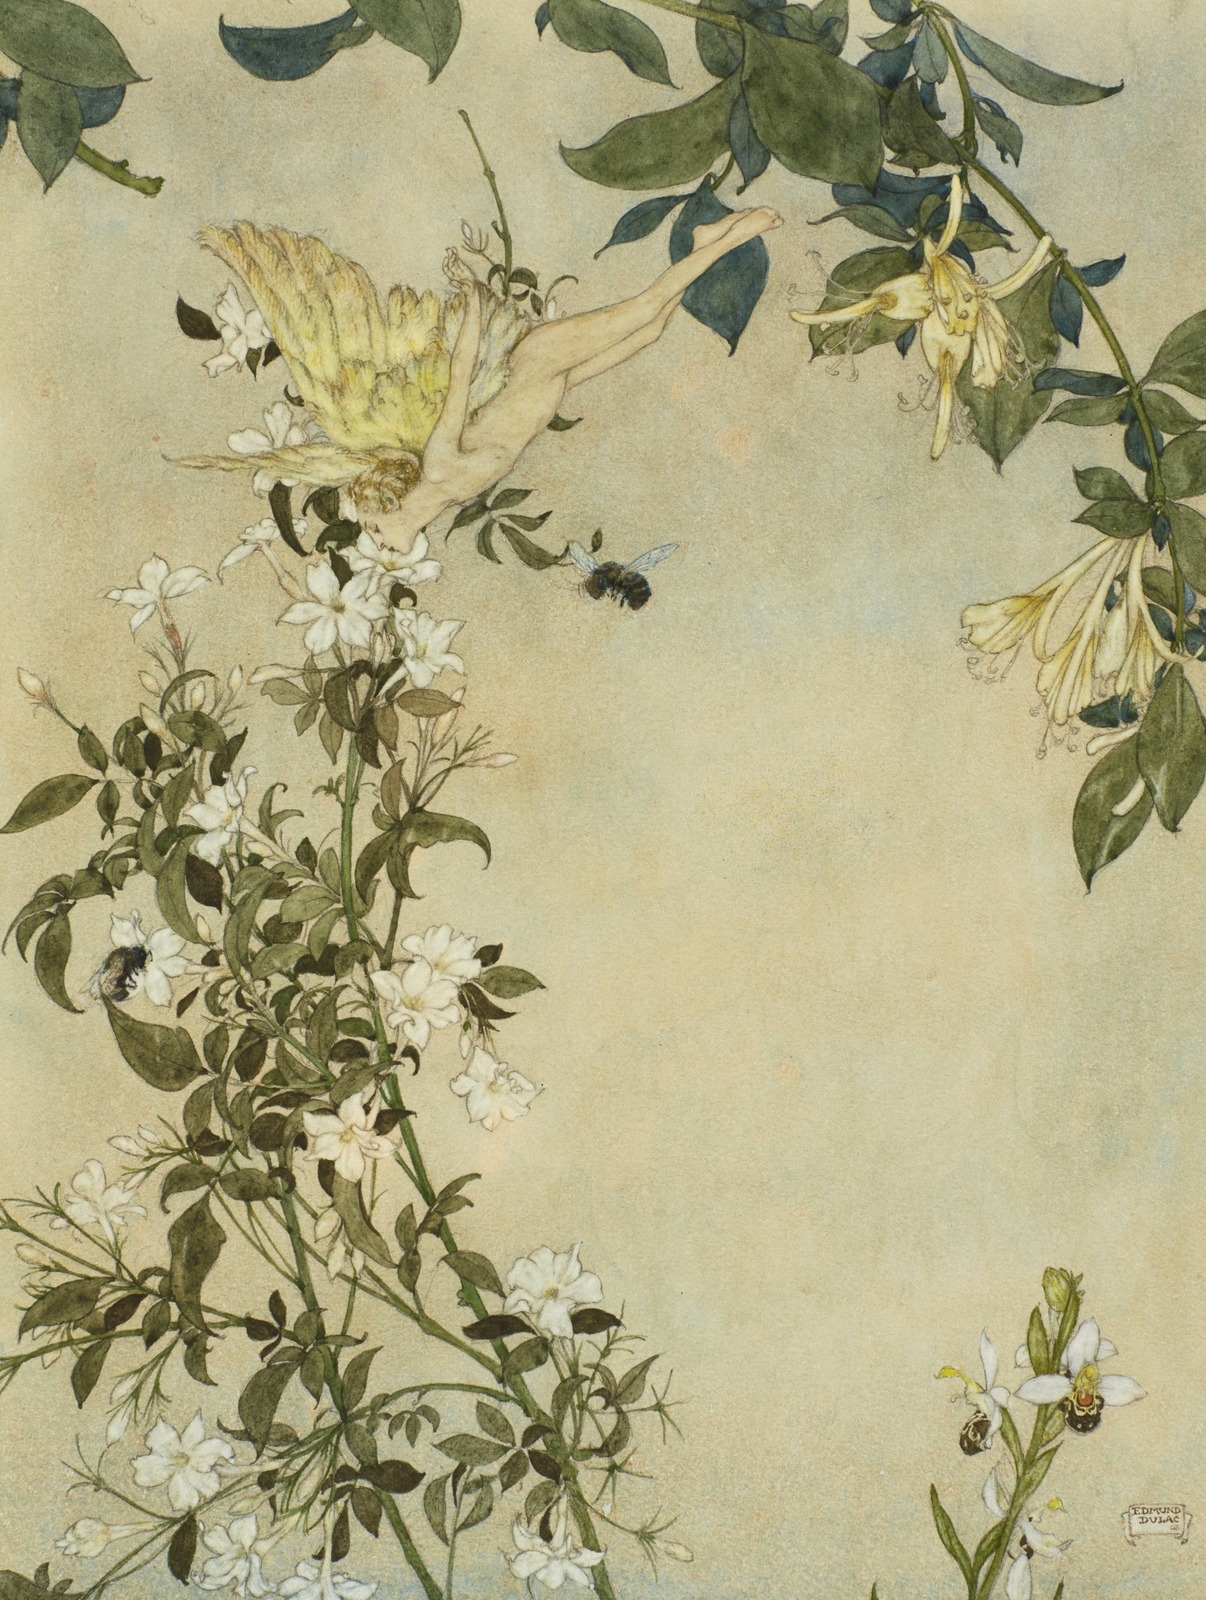 Где пчела берет нектар, там и я (Where The Bee Sucks, There Suck I)_33.2 х 24.3_акварель и тушь_Частное собрание.jpg